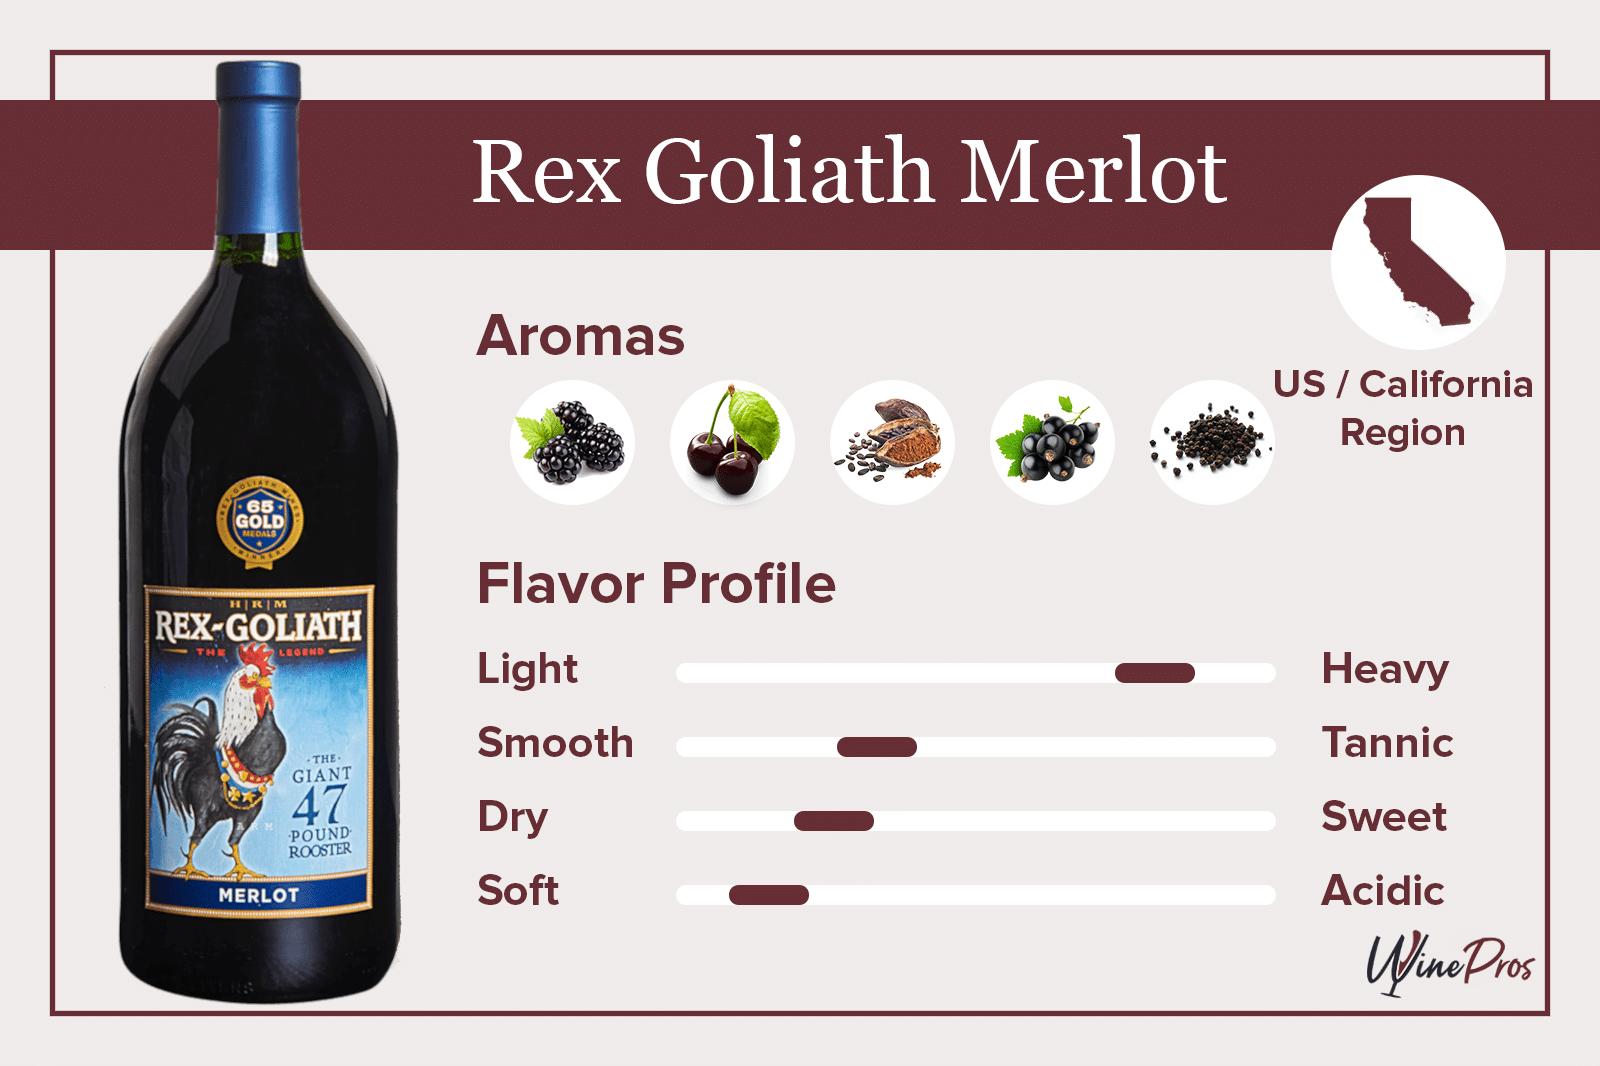 Rex Goliath Merlot Review (2021)